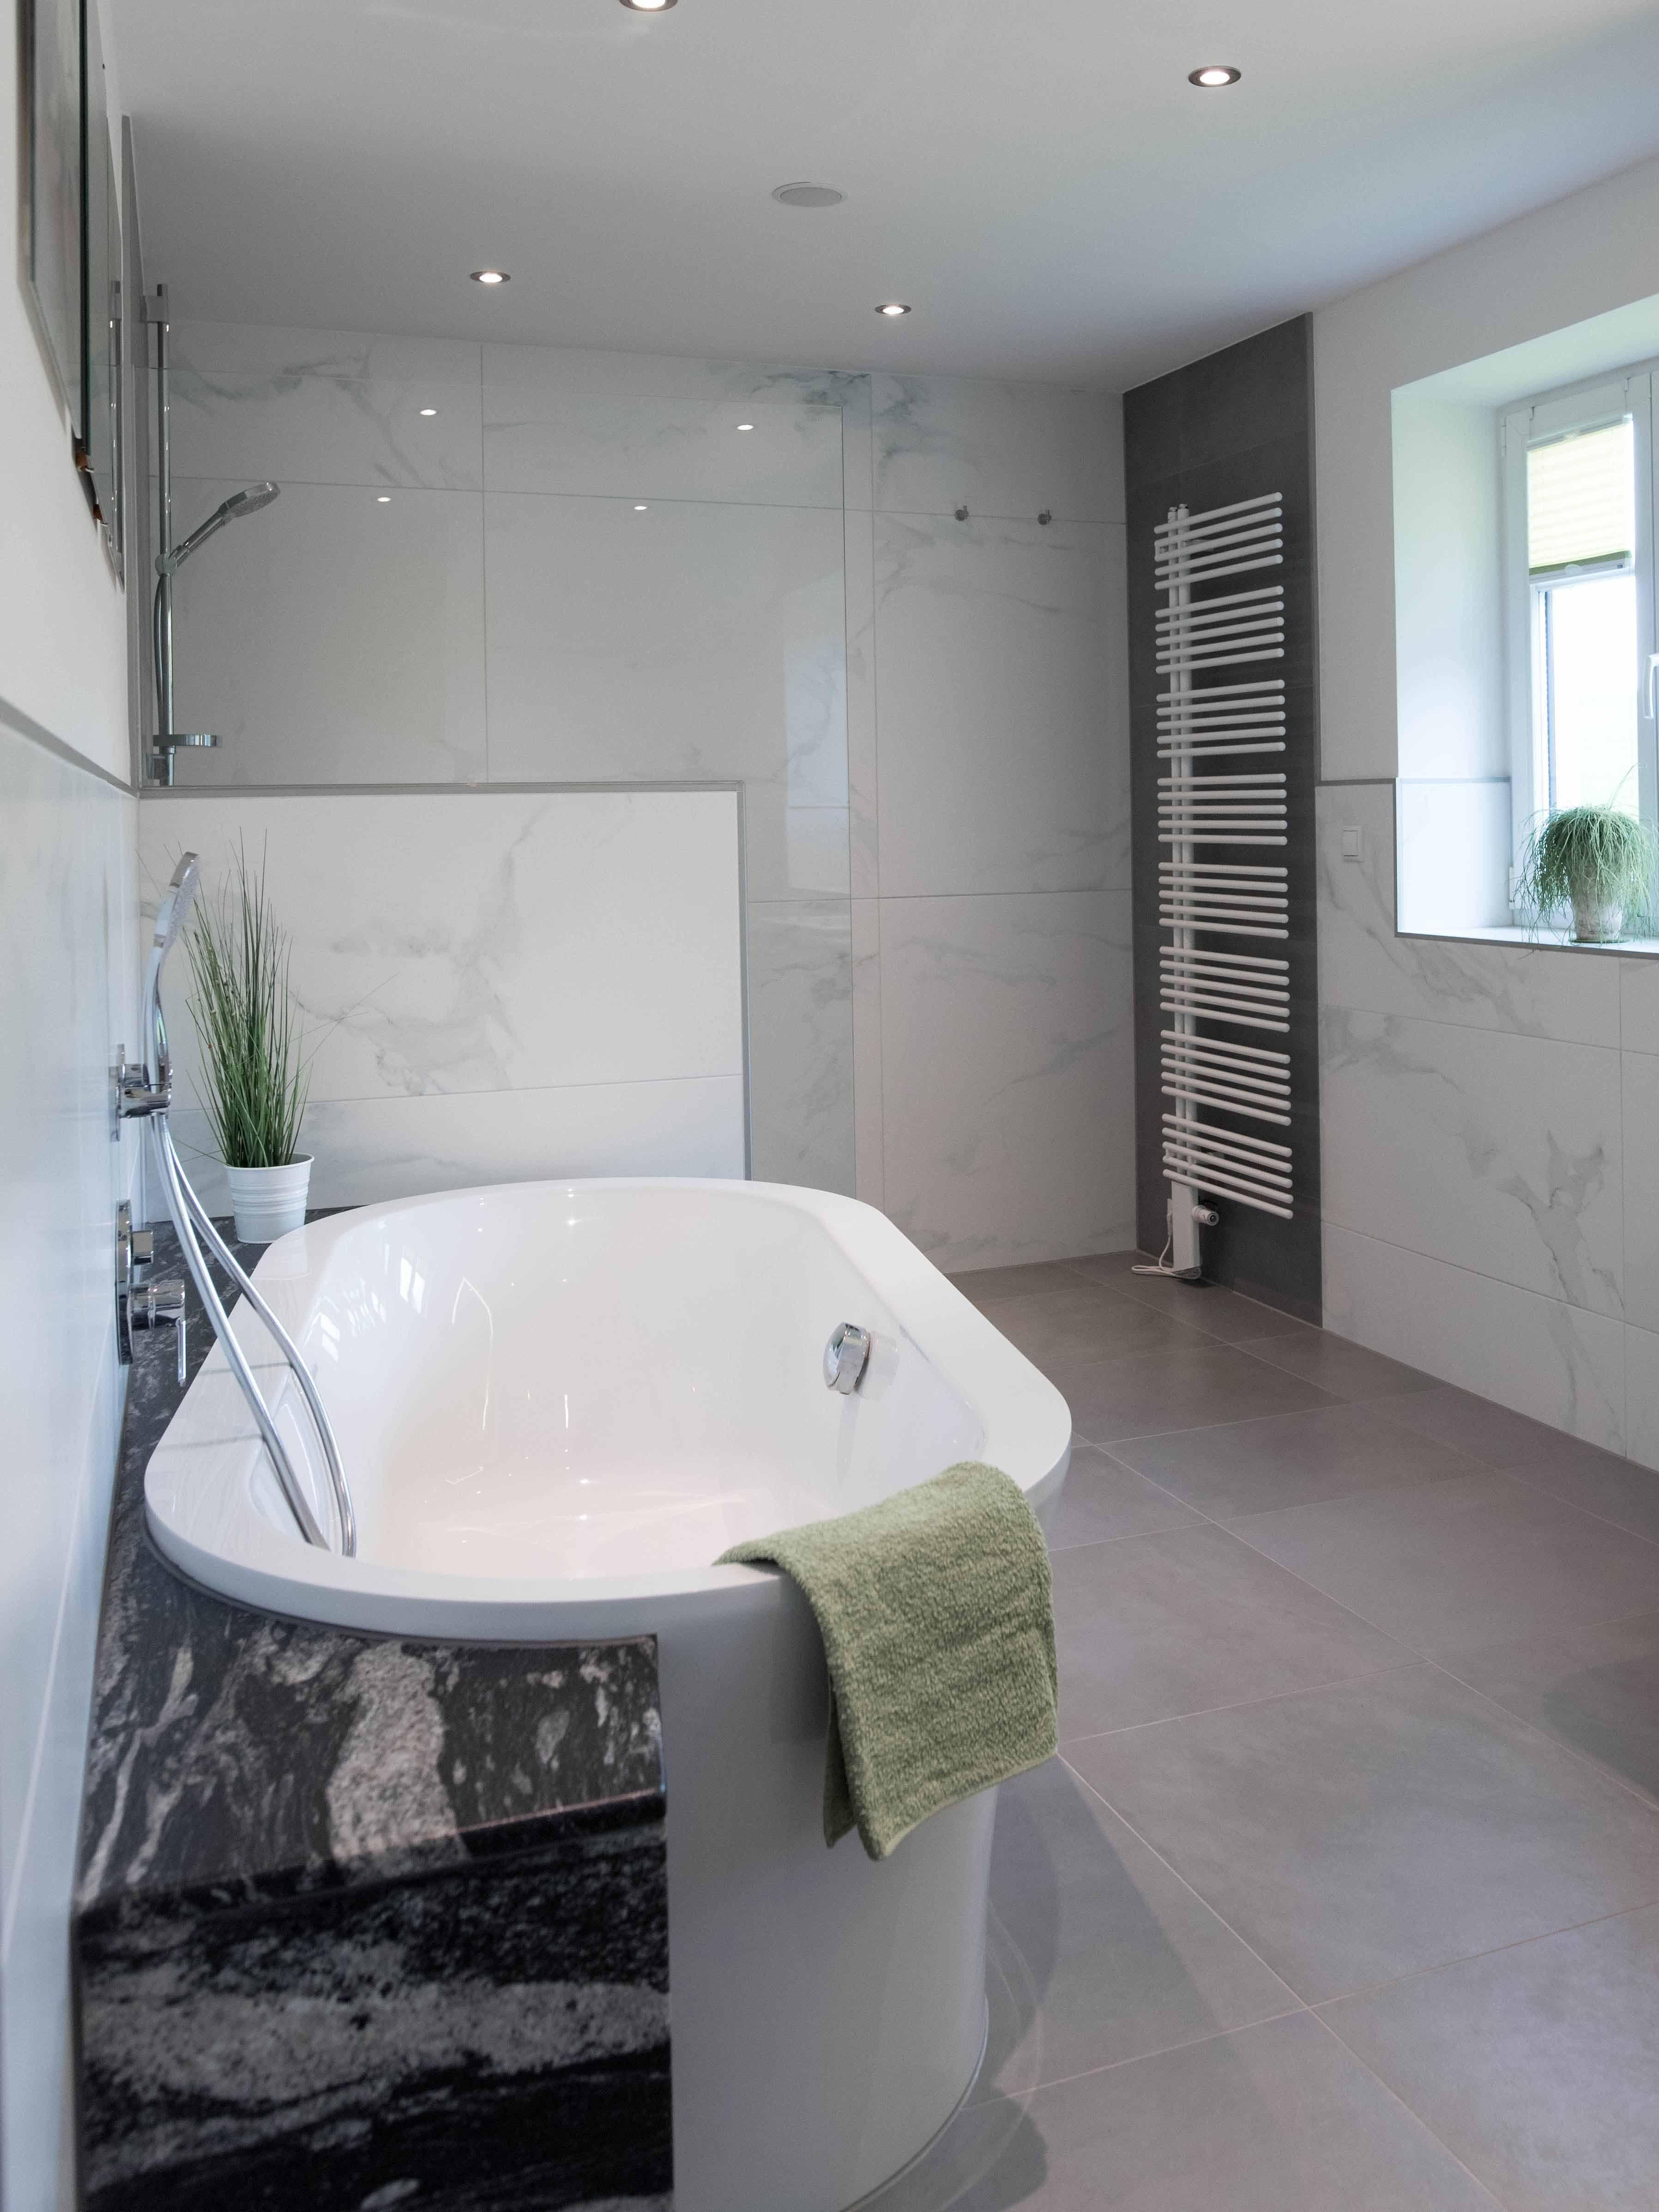 Badezimmer ideen 2018 bilder inspirieren lassen auf in   badideen  pinterest